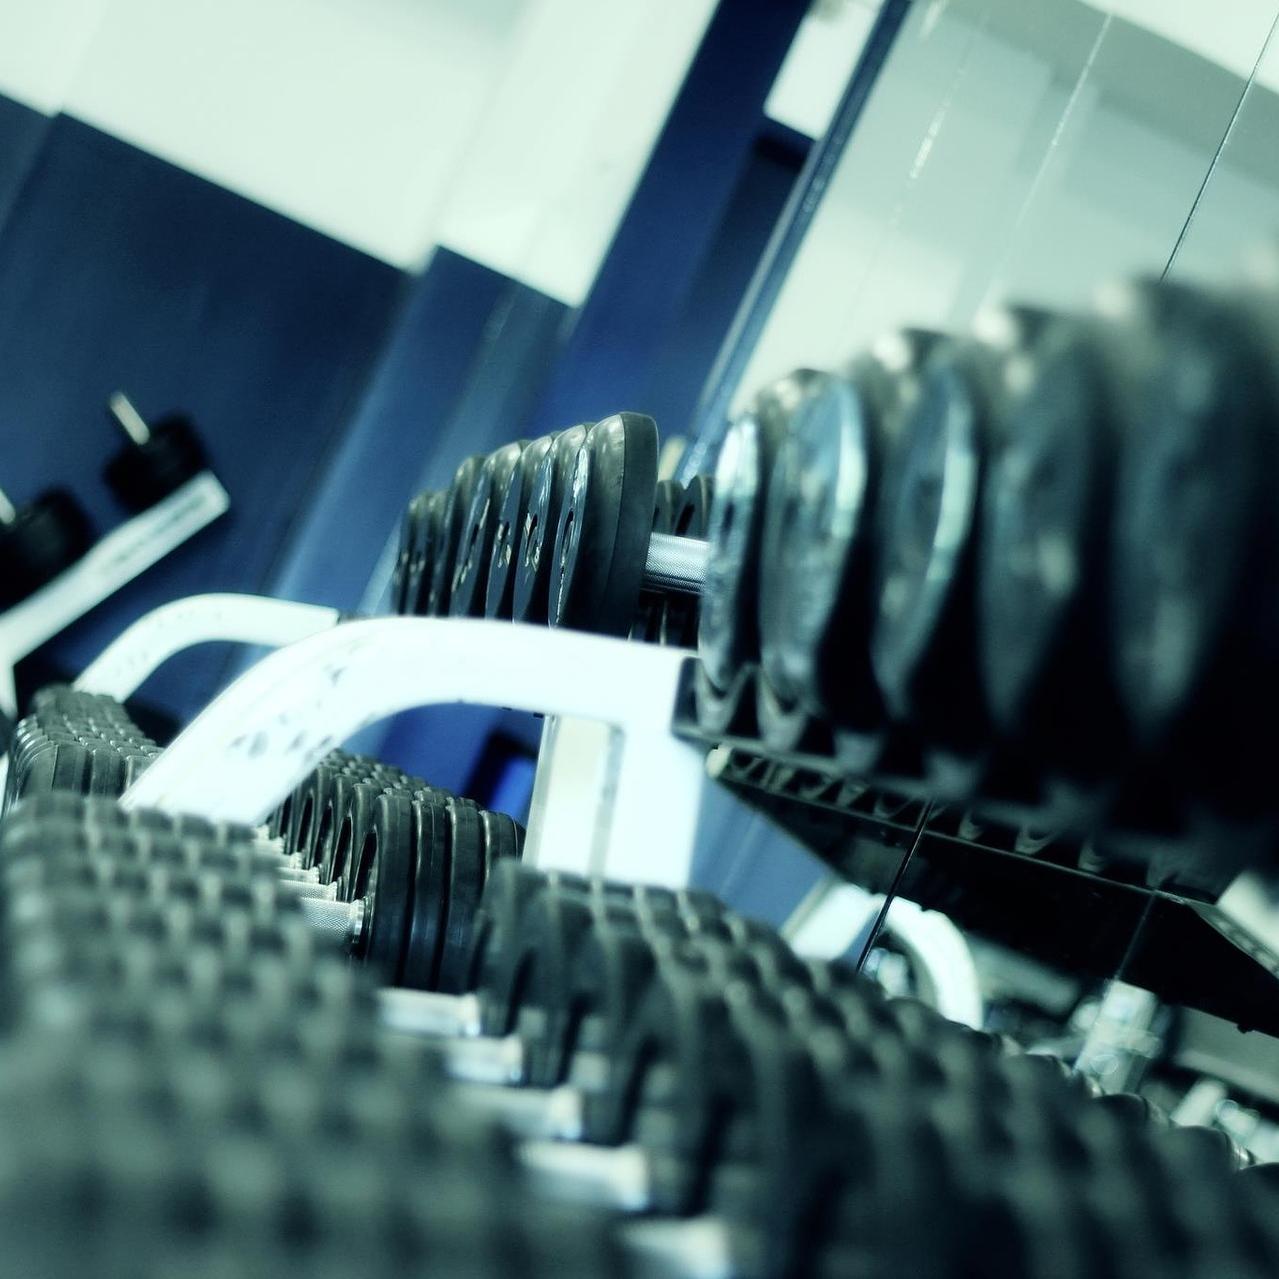 Gym 12 mån/kk